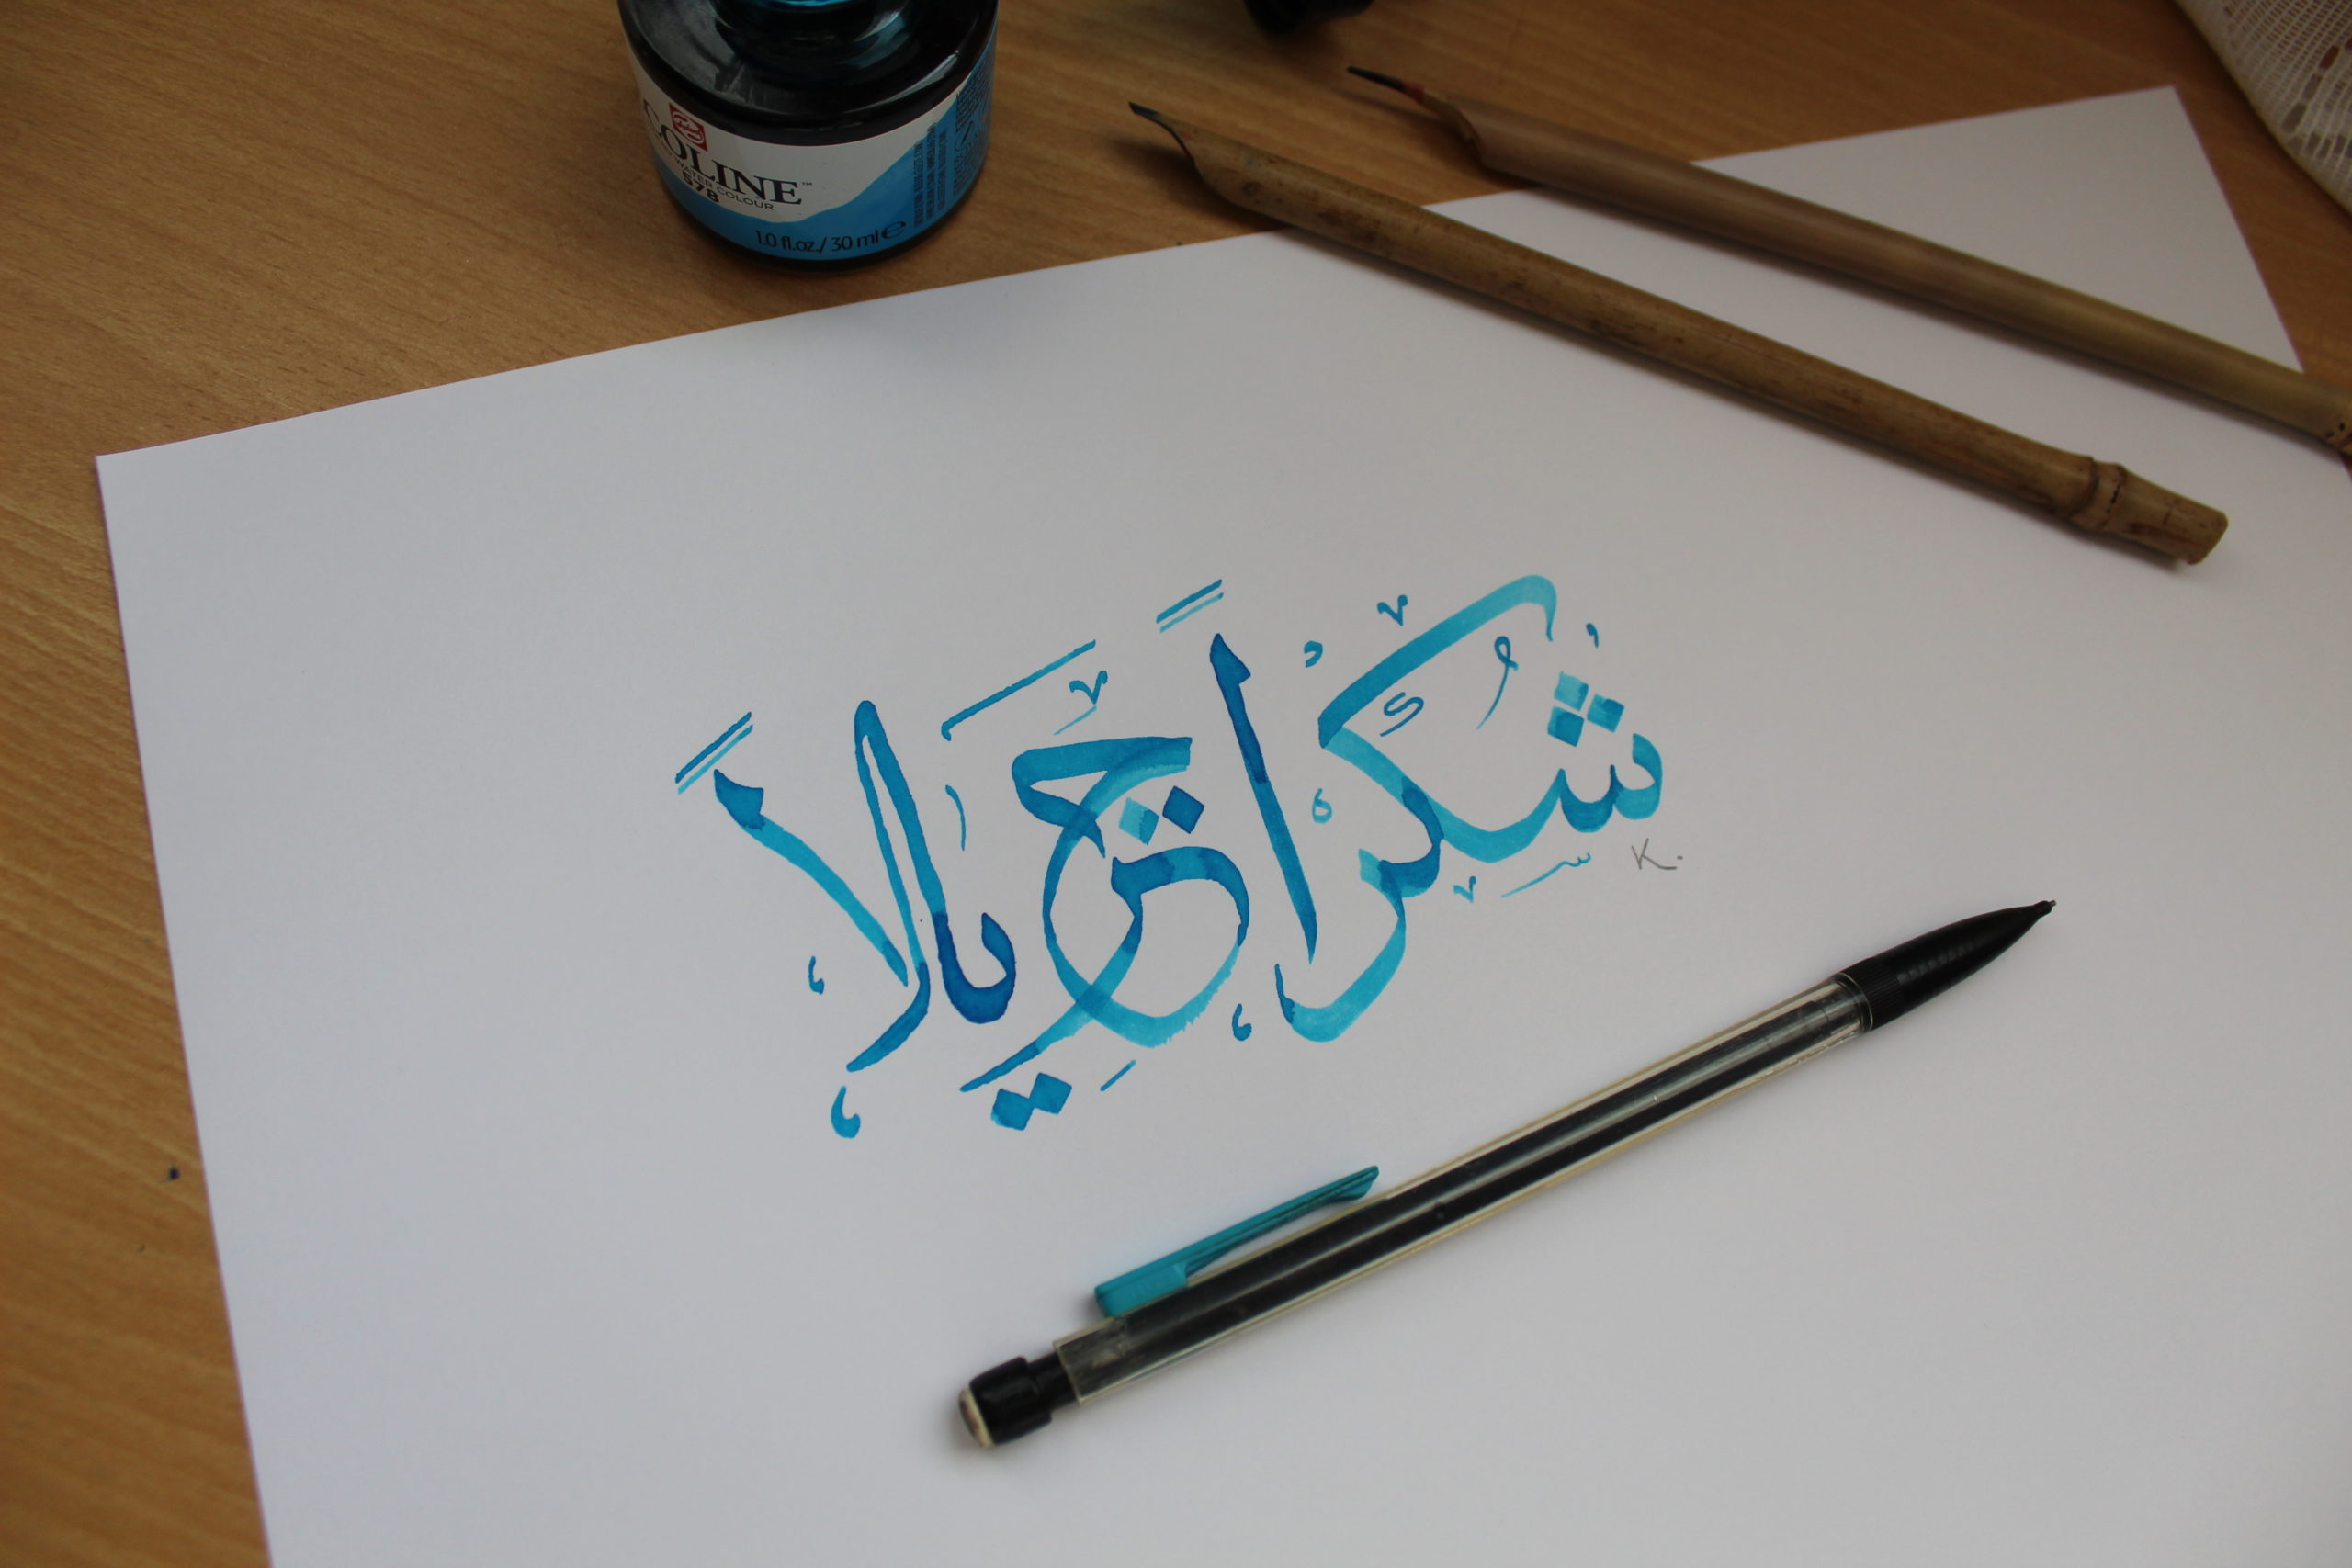 calligraphie merci beaucoup